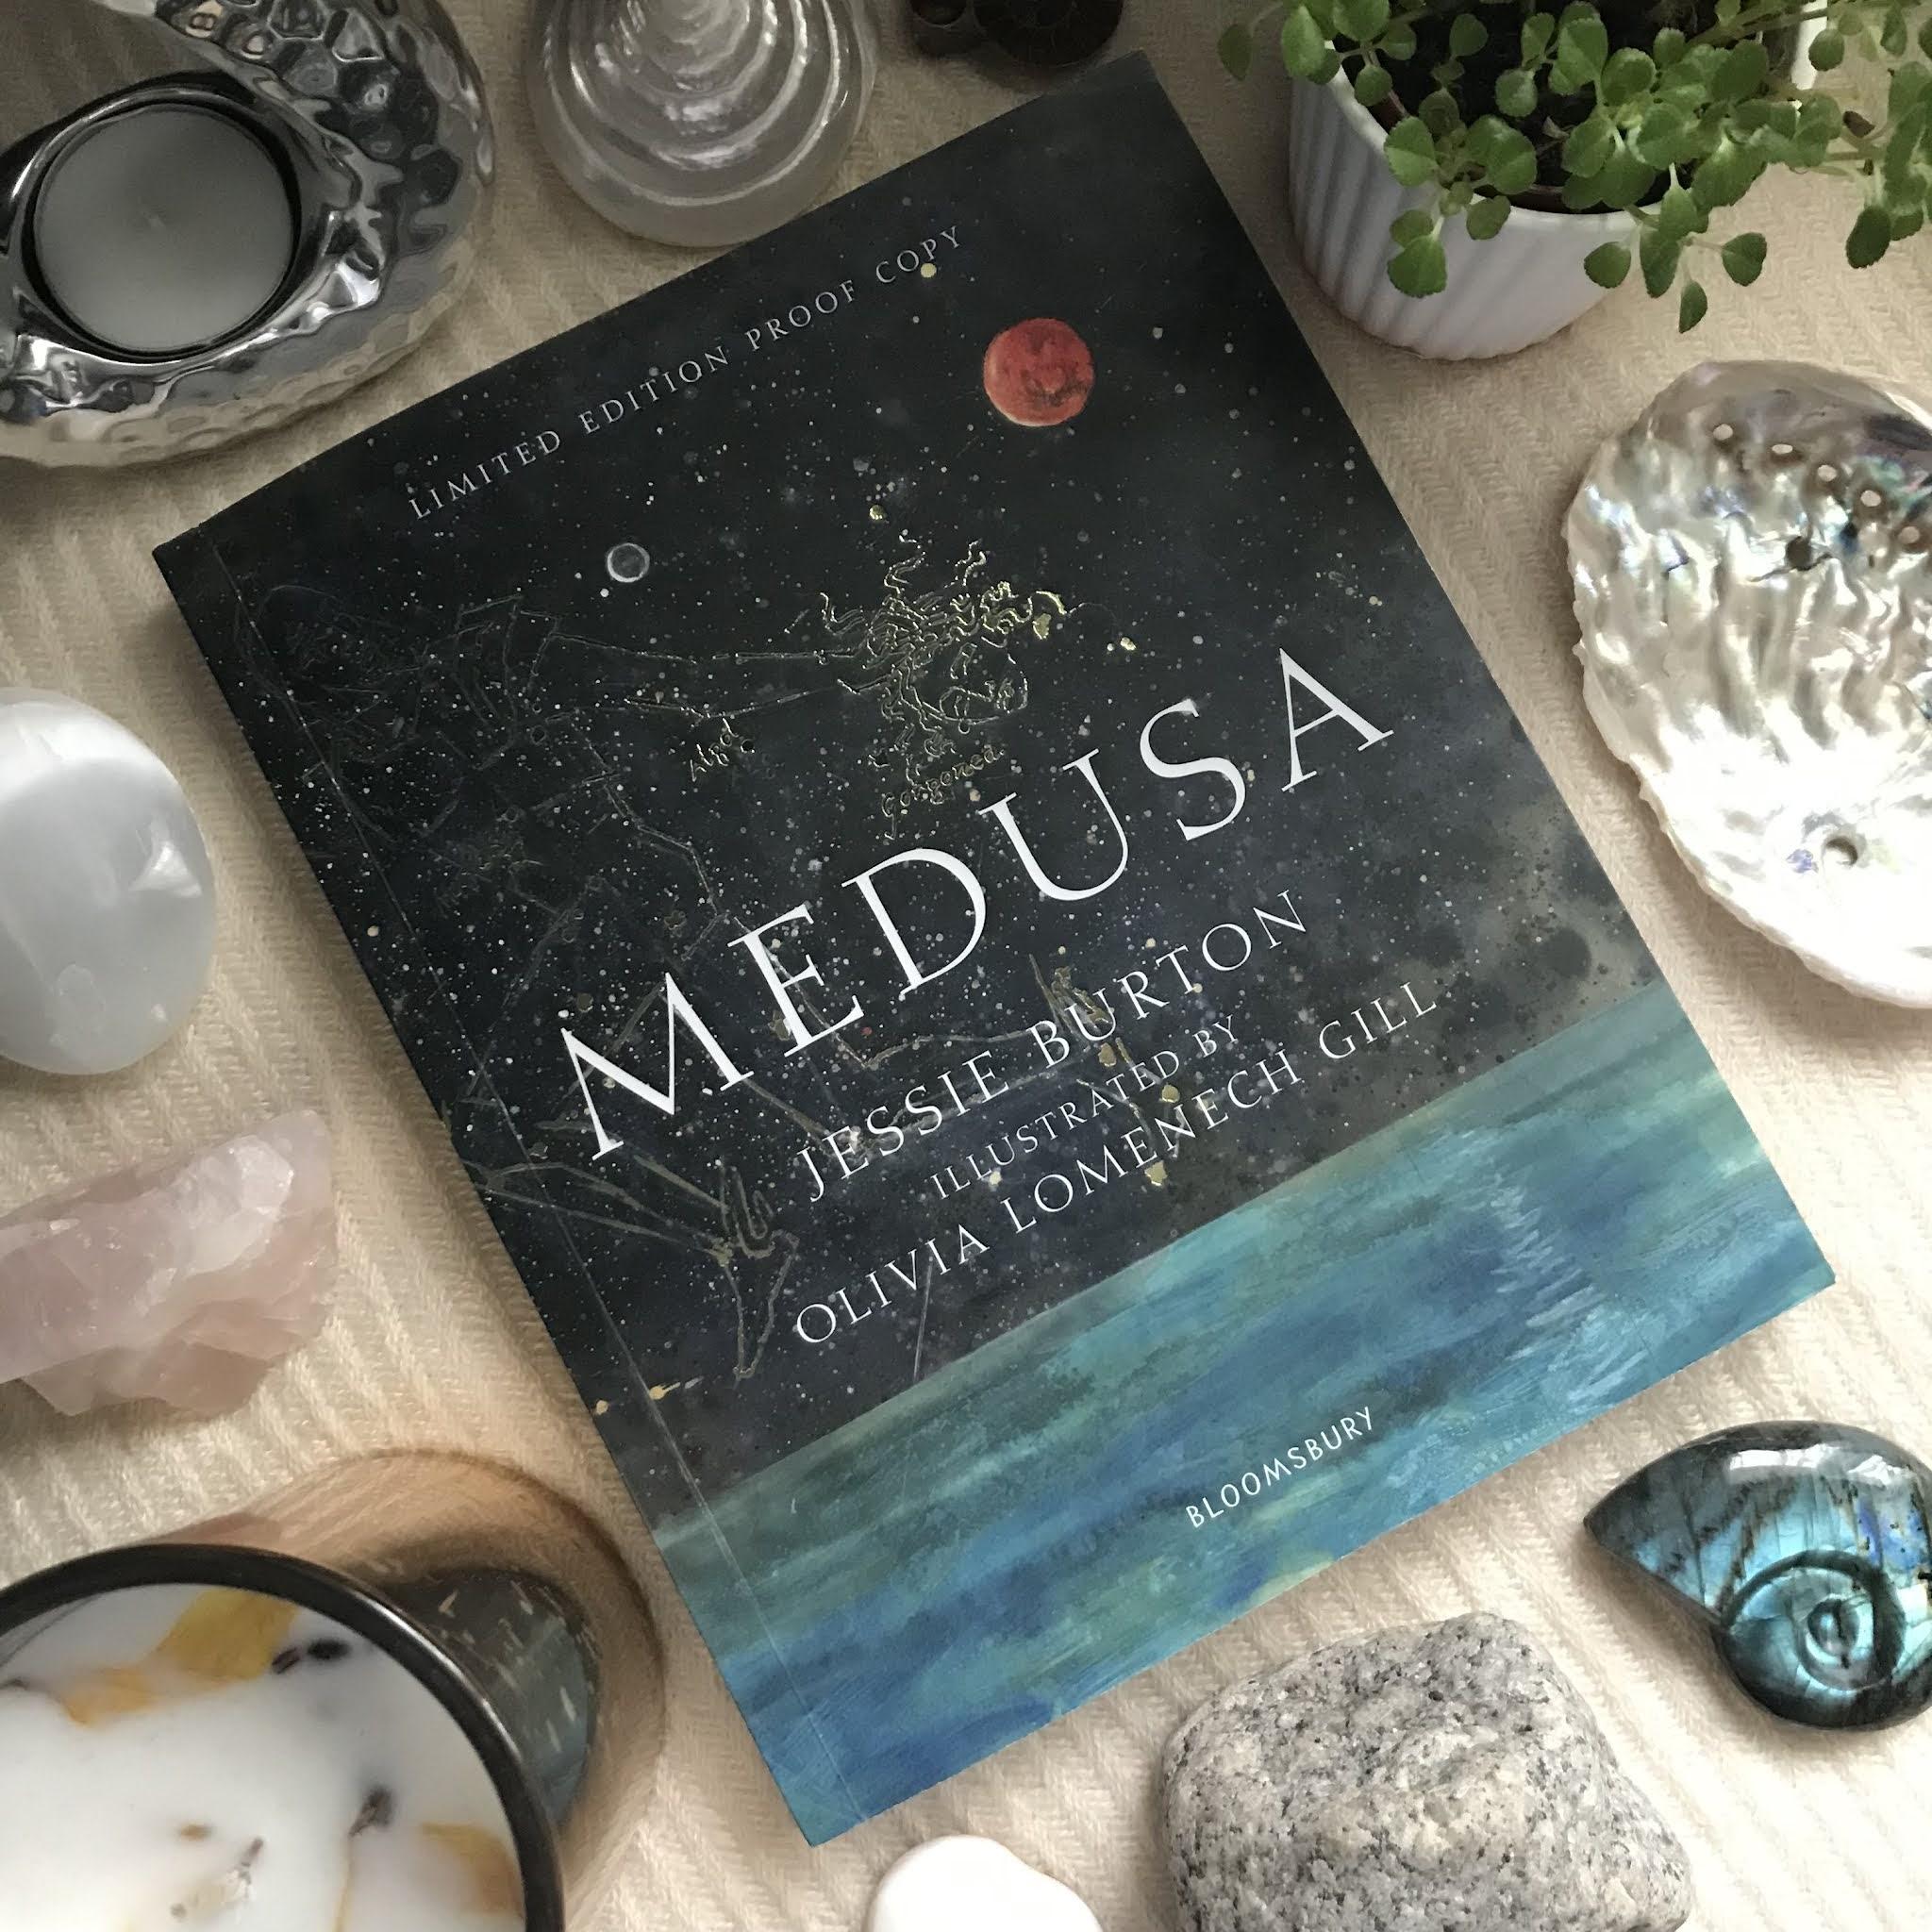 Medusa by Jessie Burton